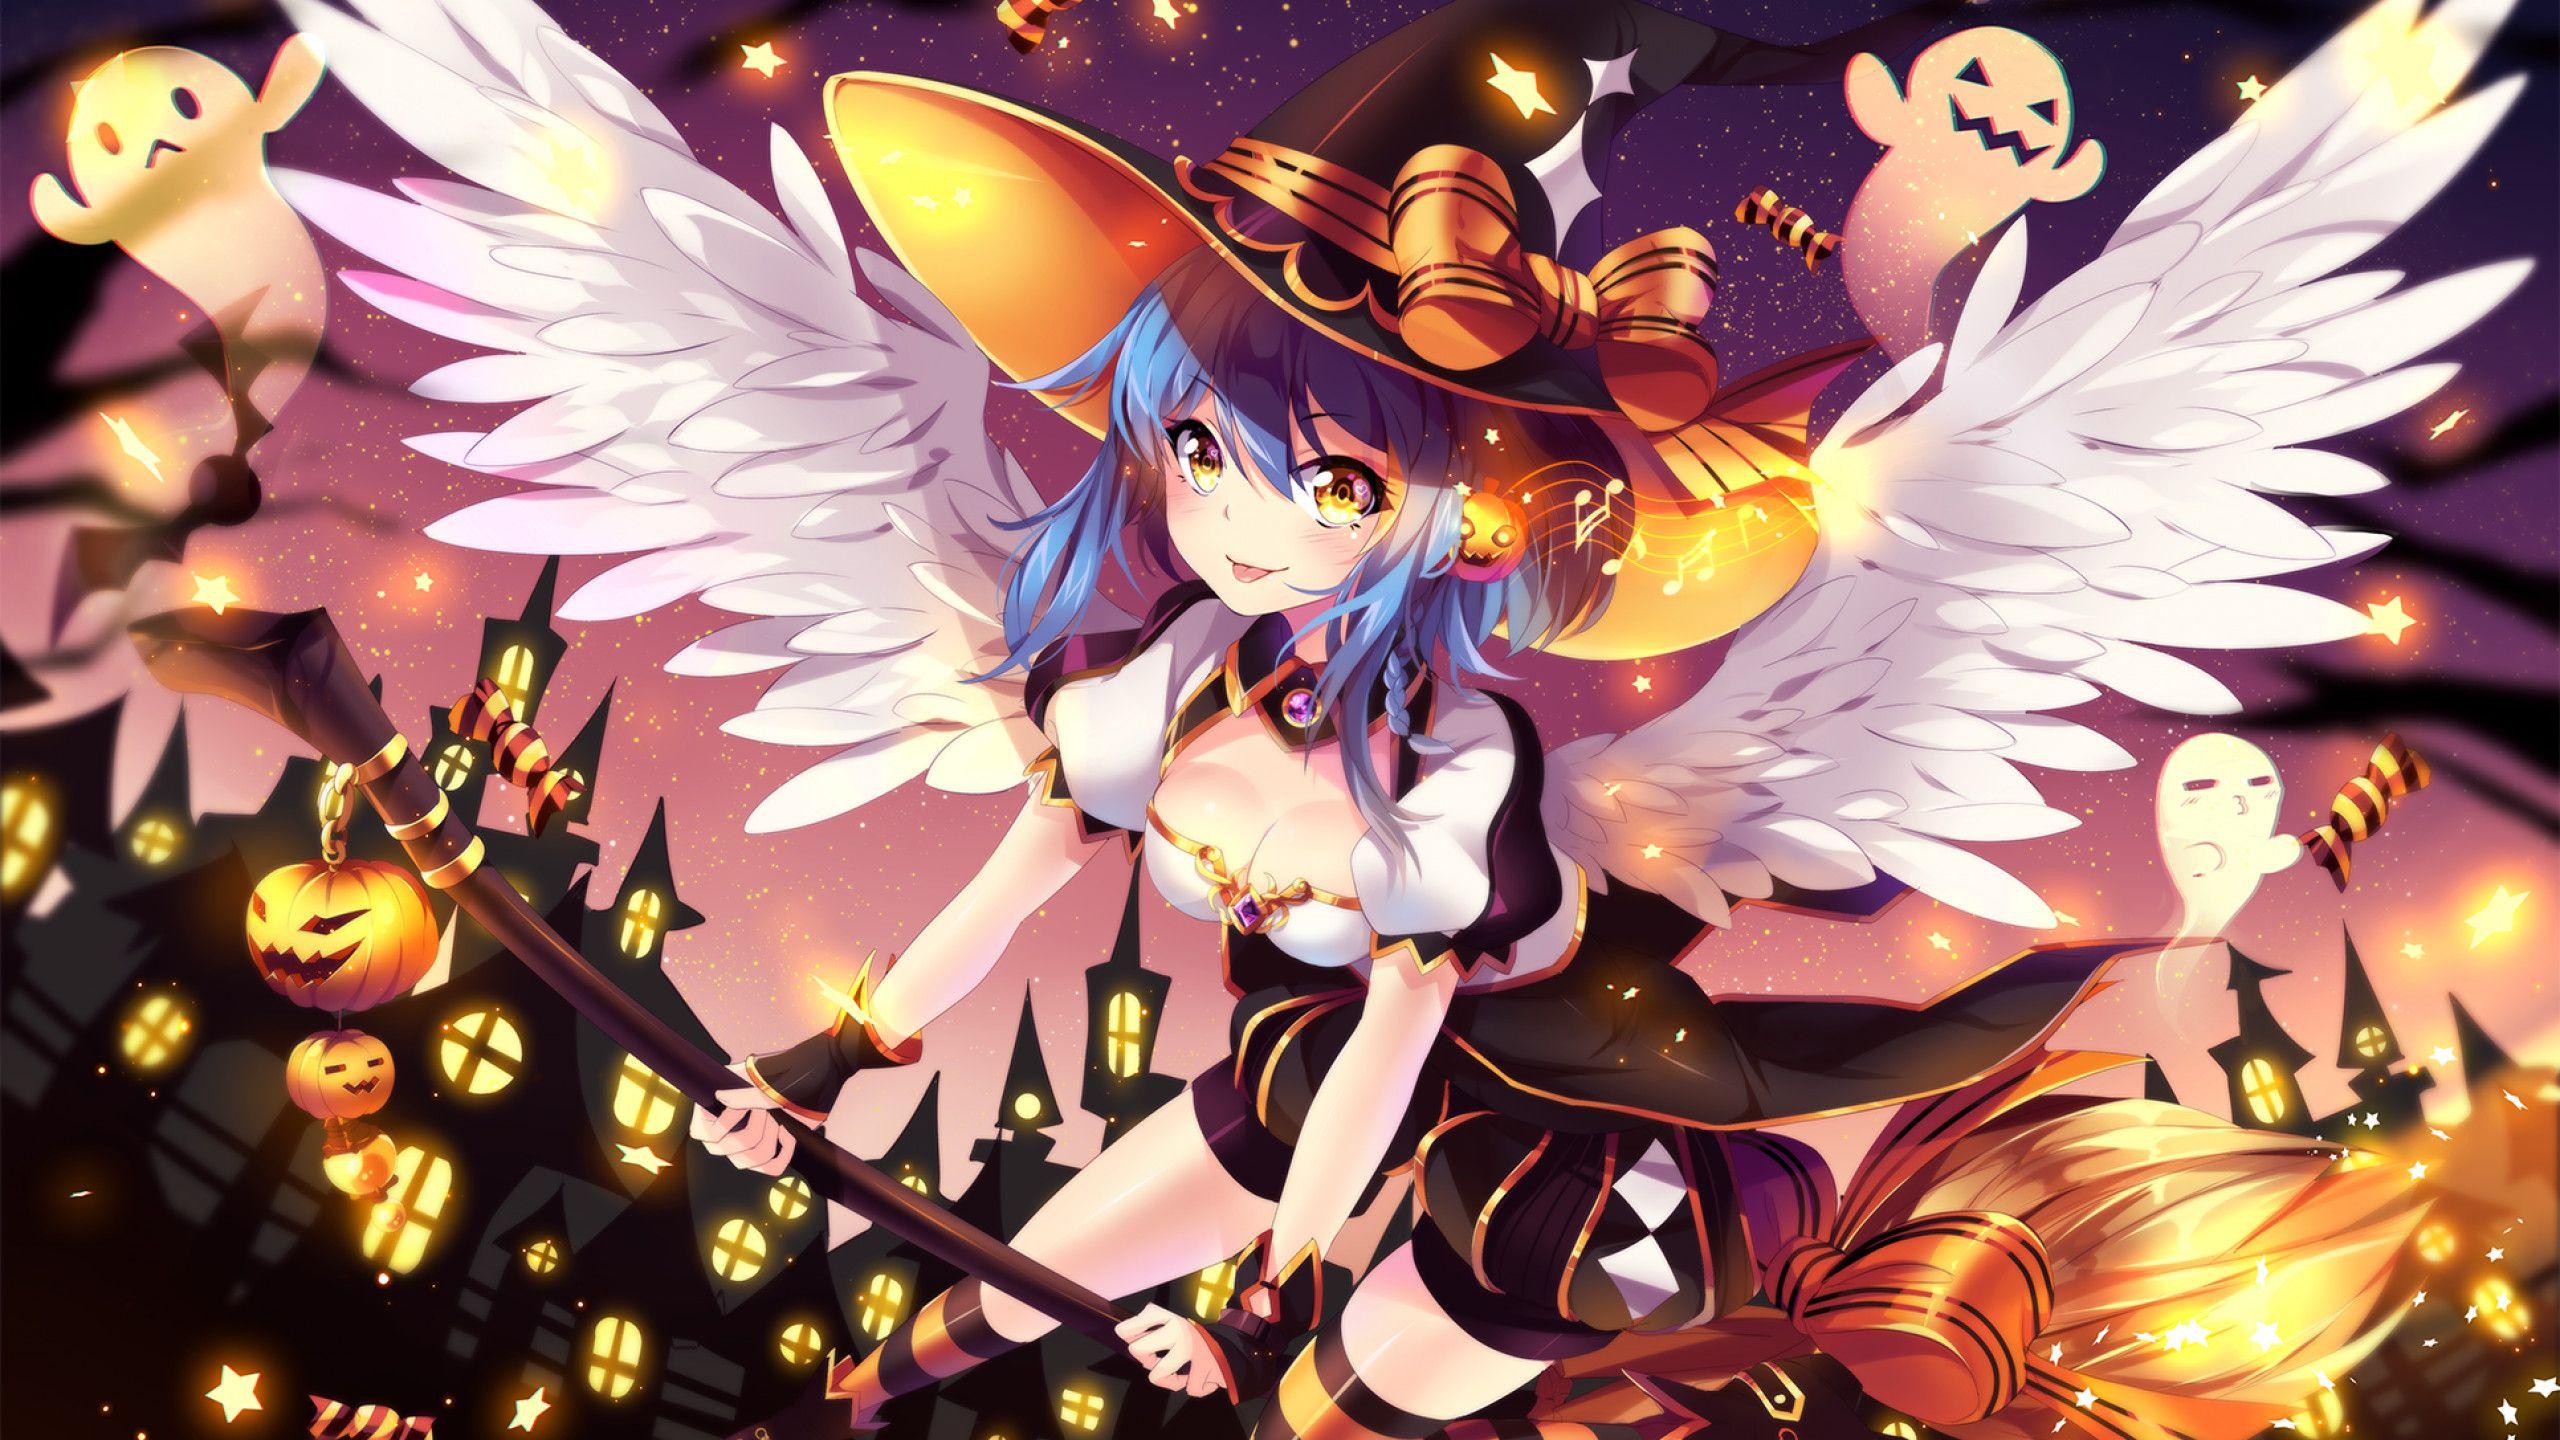 Pin On Ooc Ideas Halloween anime wallpaper hd